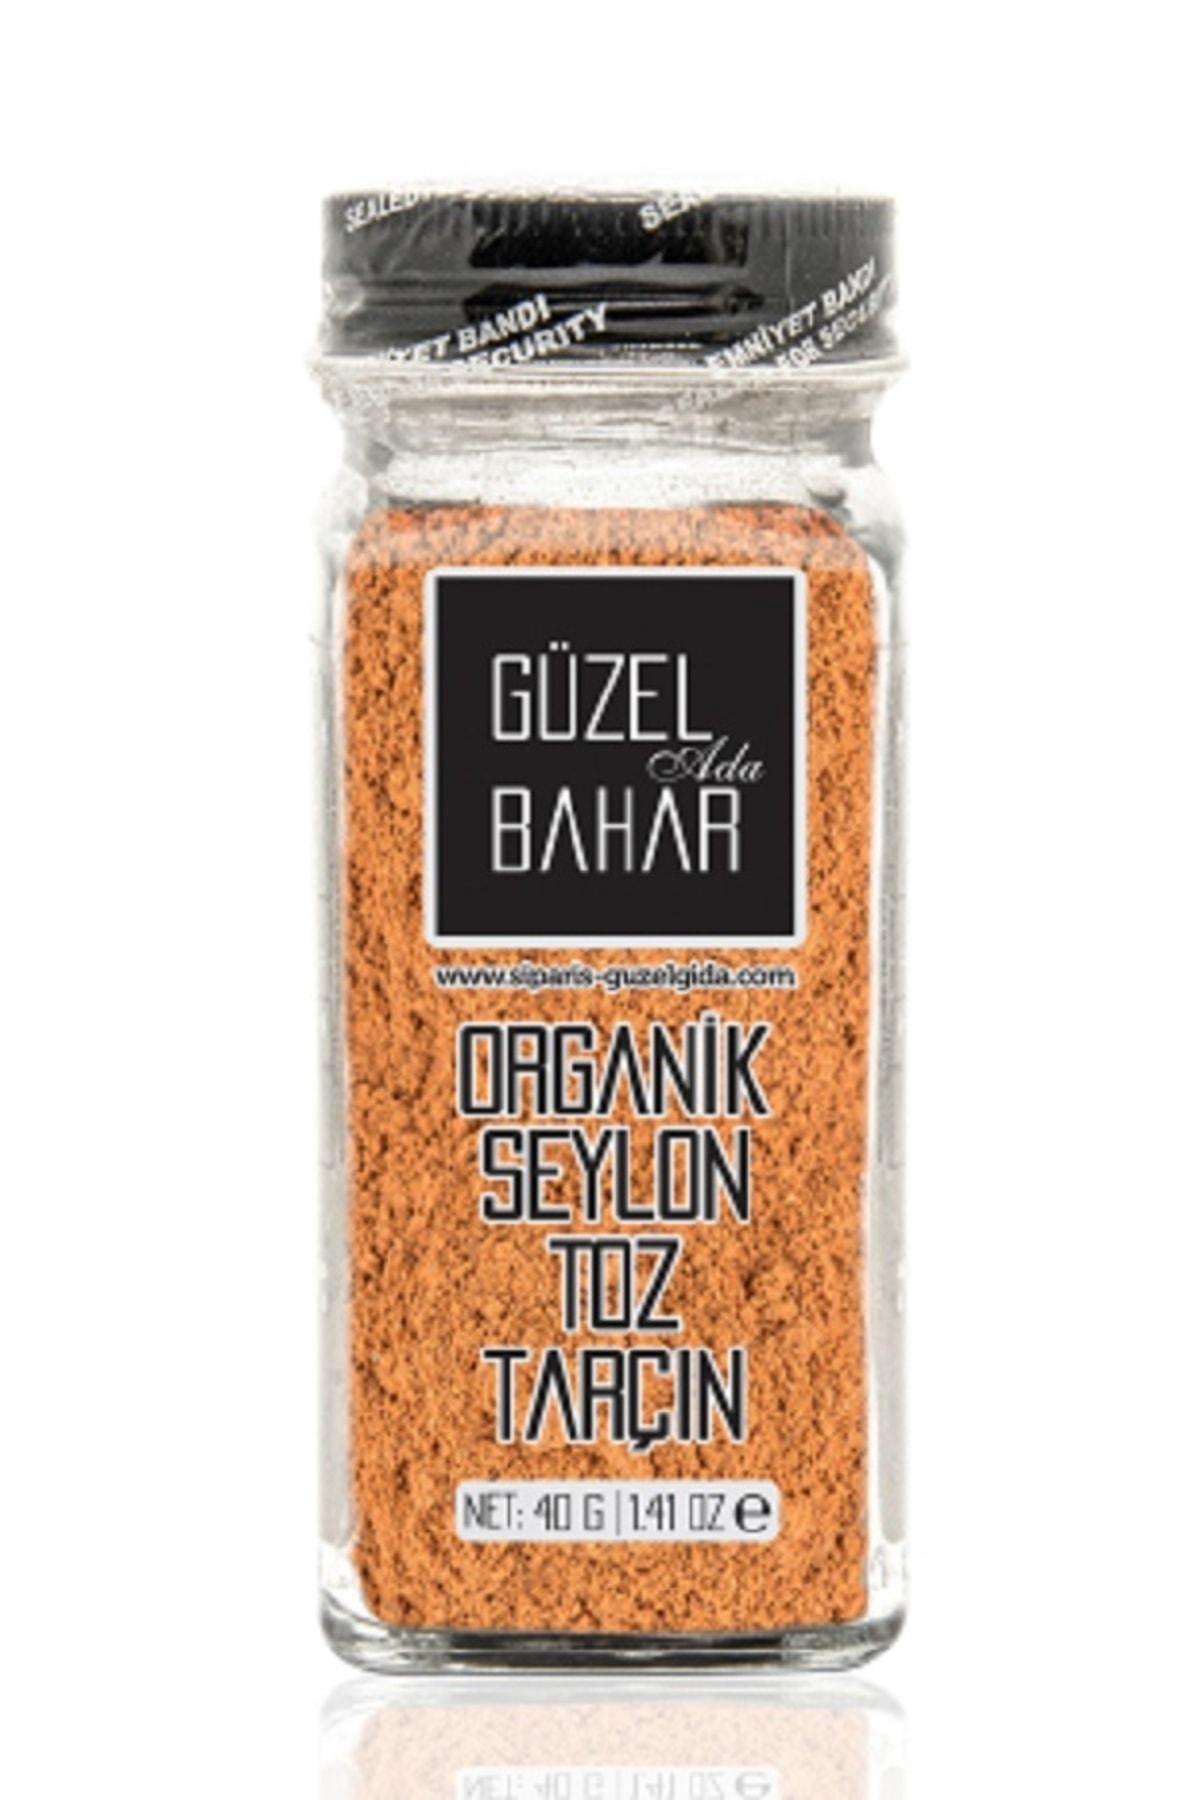 Organik Seylon Toz Tarçın 40 gr